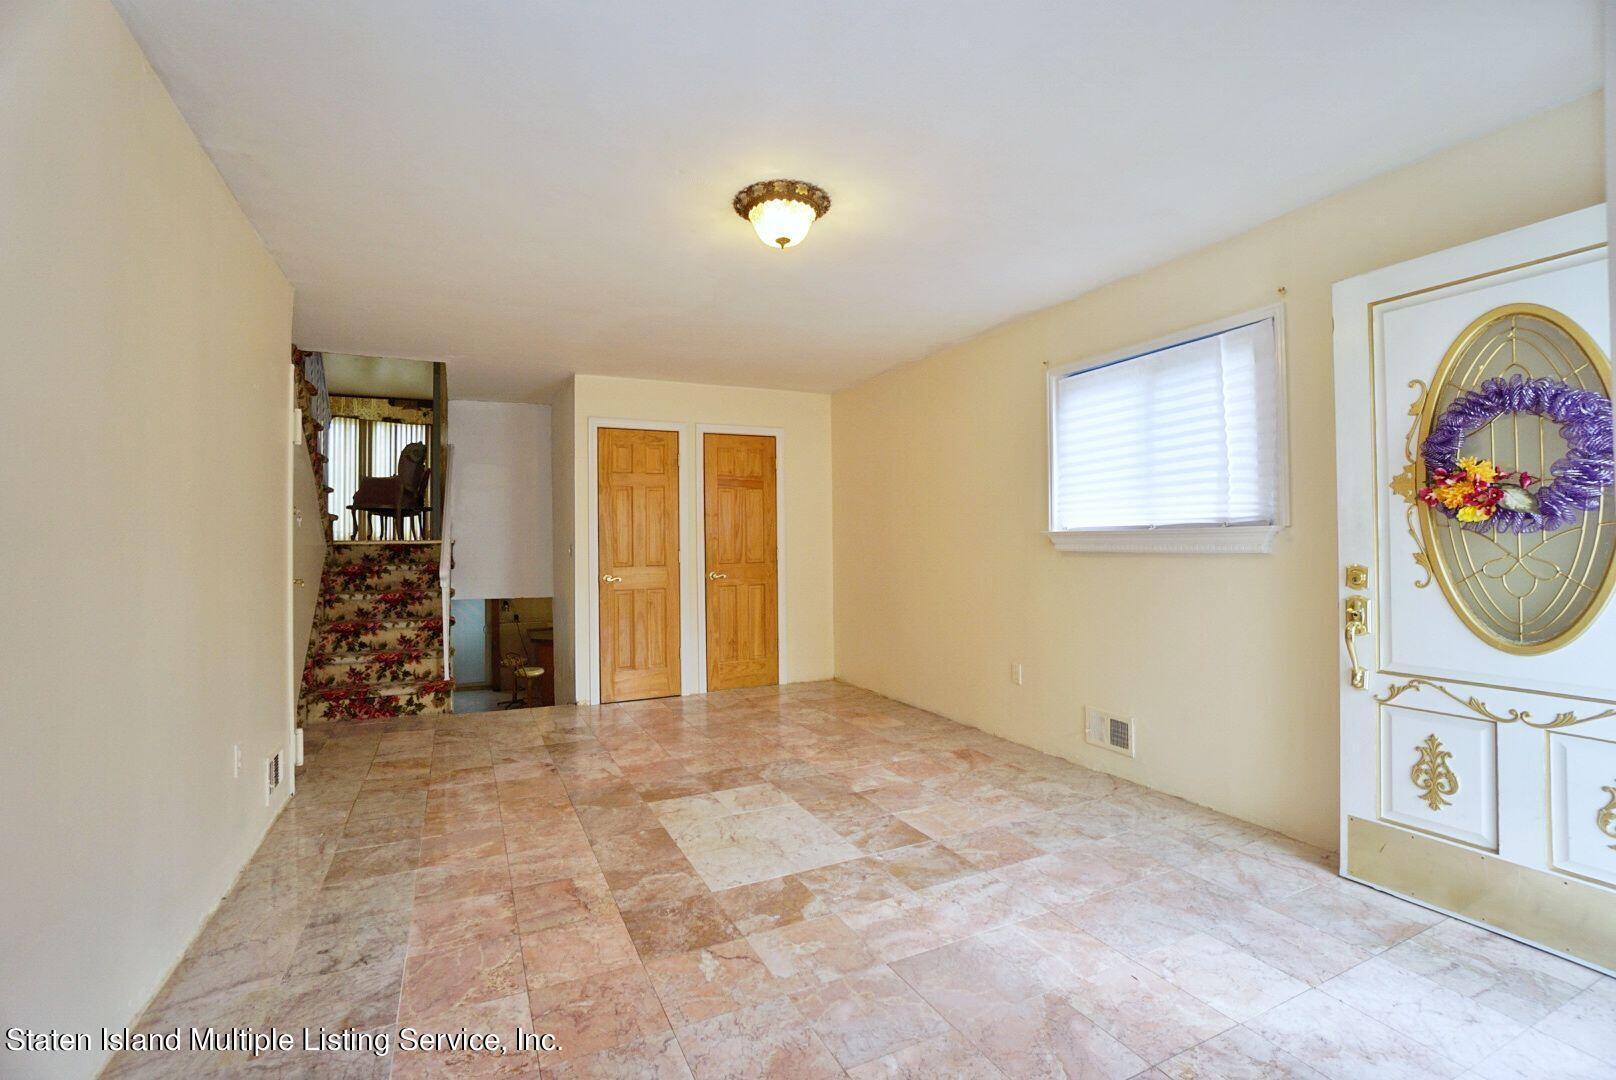 Single Family - Detached 94 Cranford Avenue  Staten Island, NY 10306, MLS-1146620-9